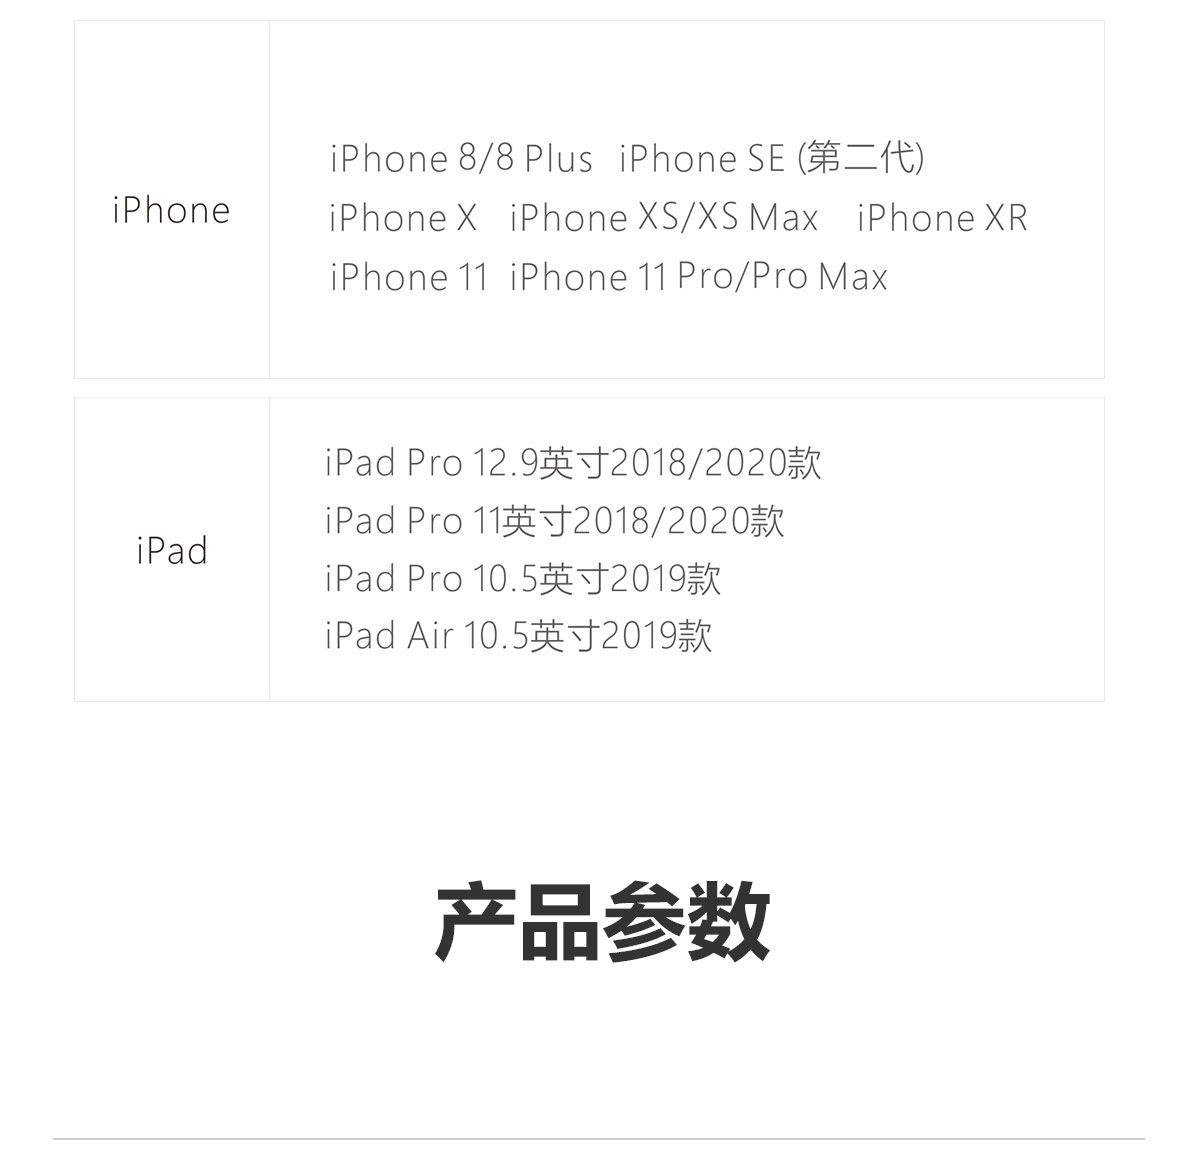 iPhone 全系列产品